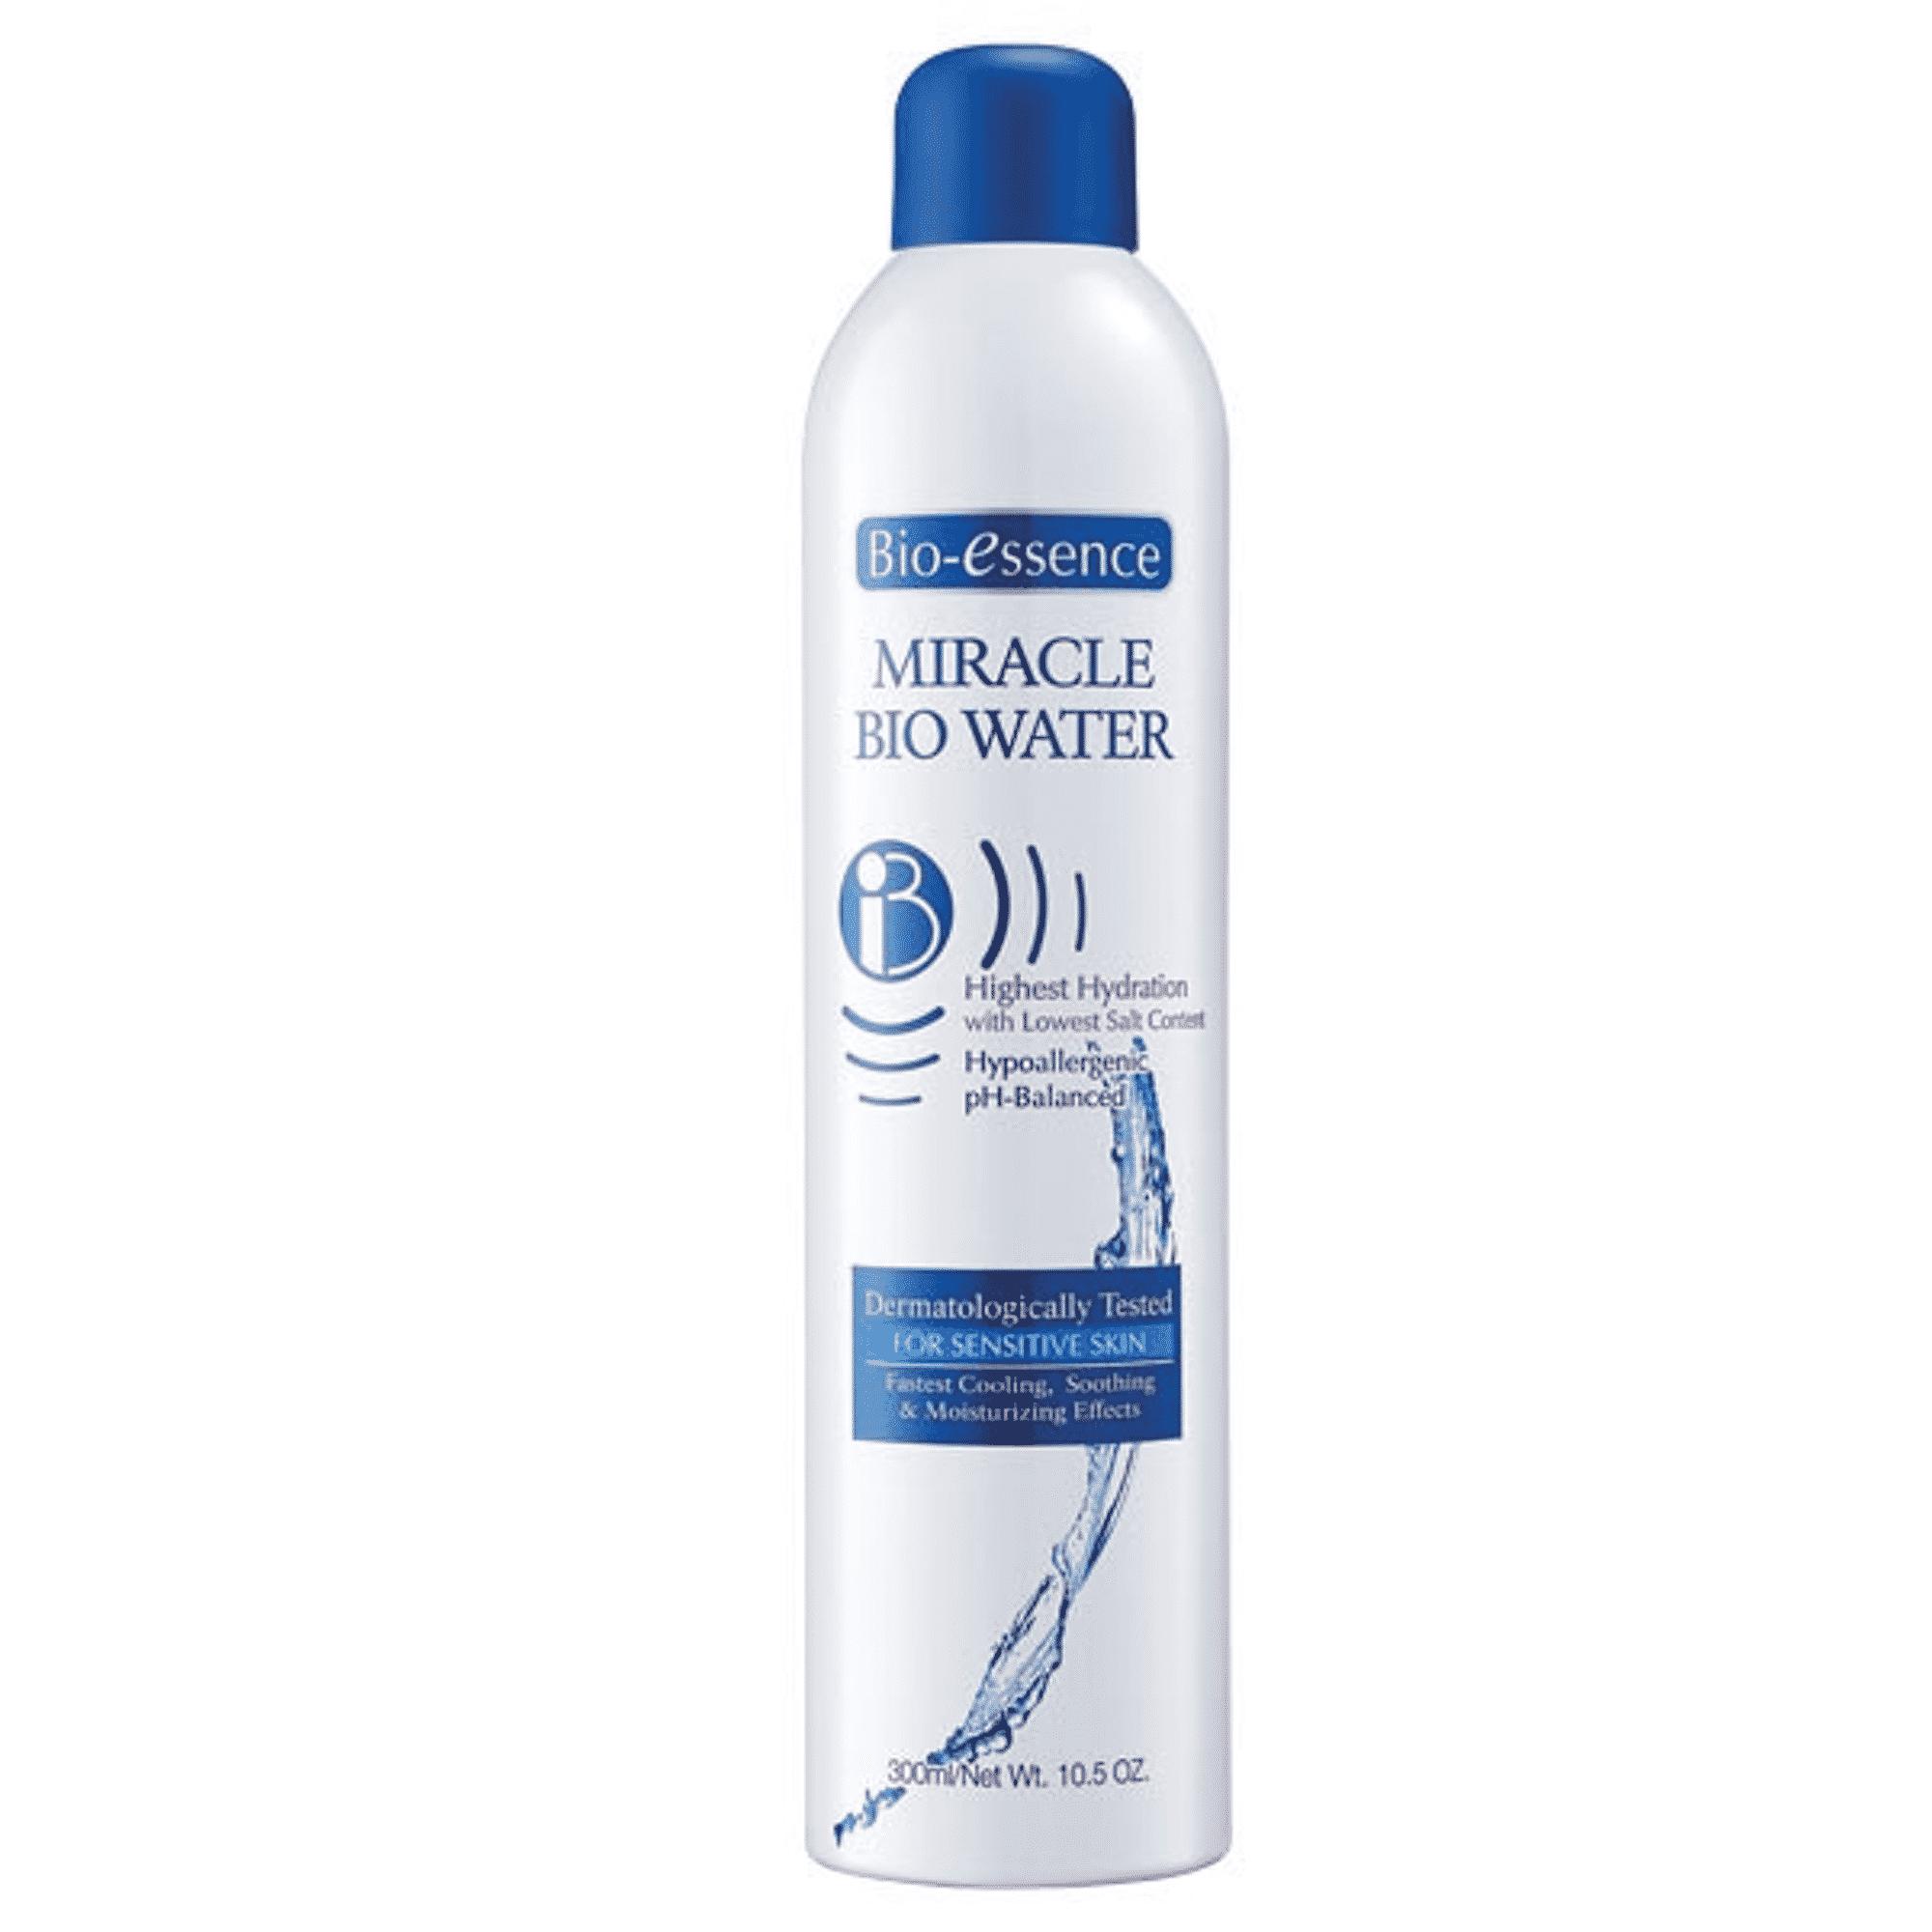 Bio-Essence-Miracle-Bio-Water